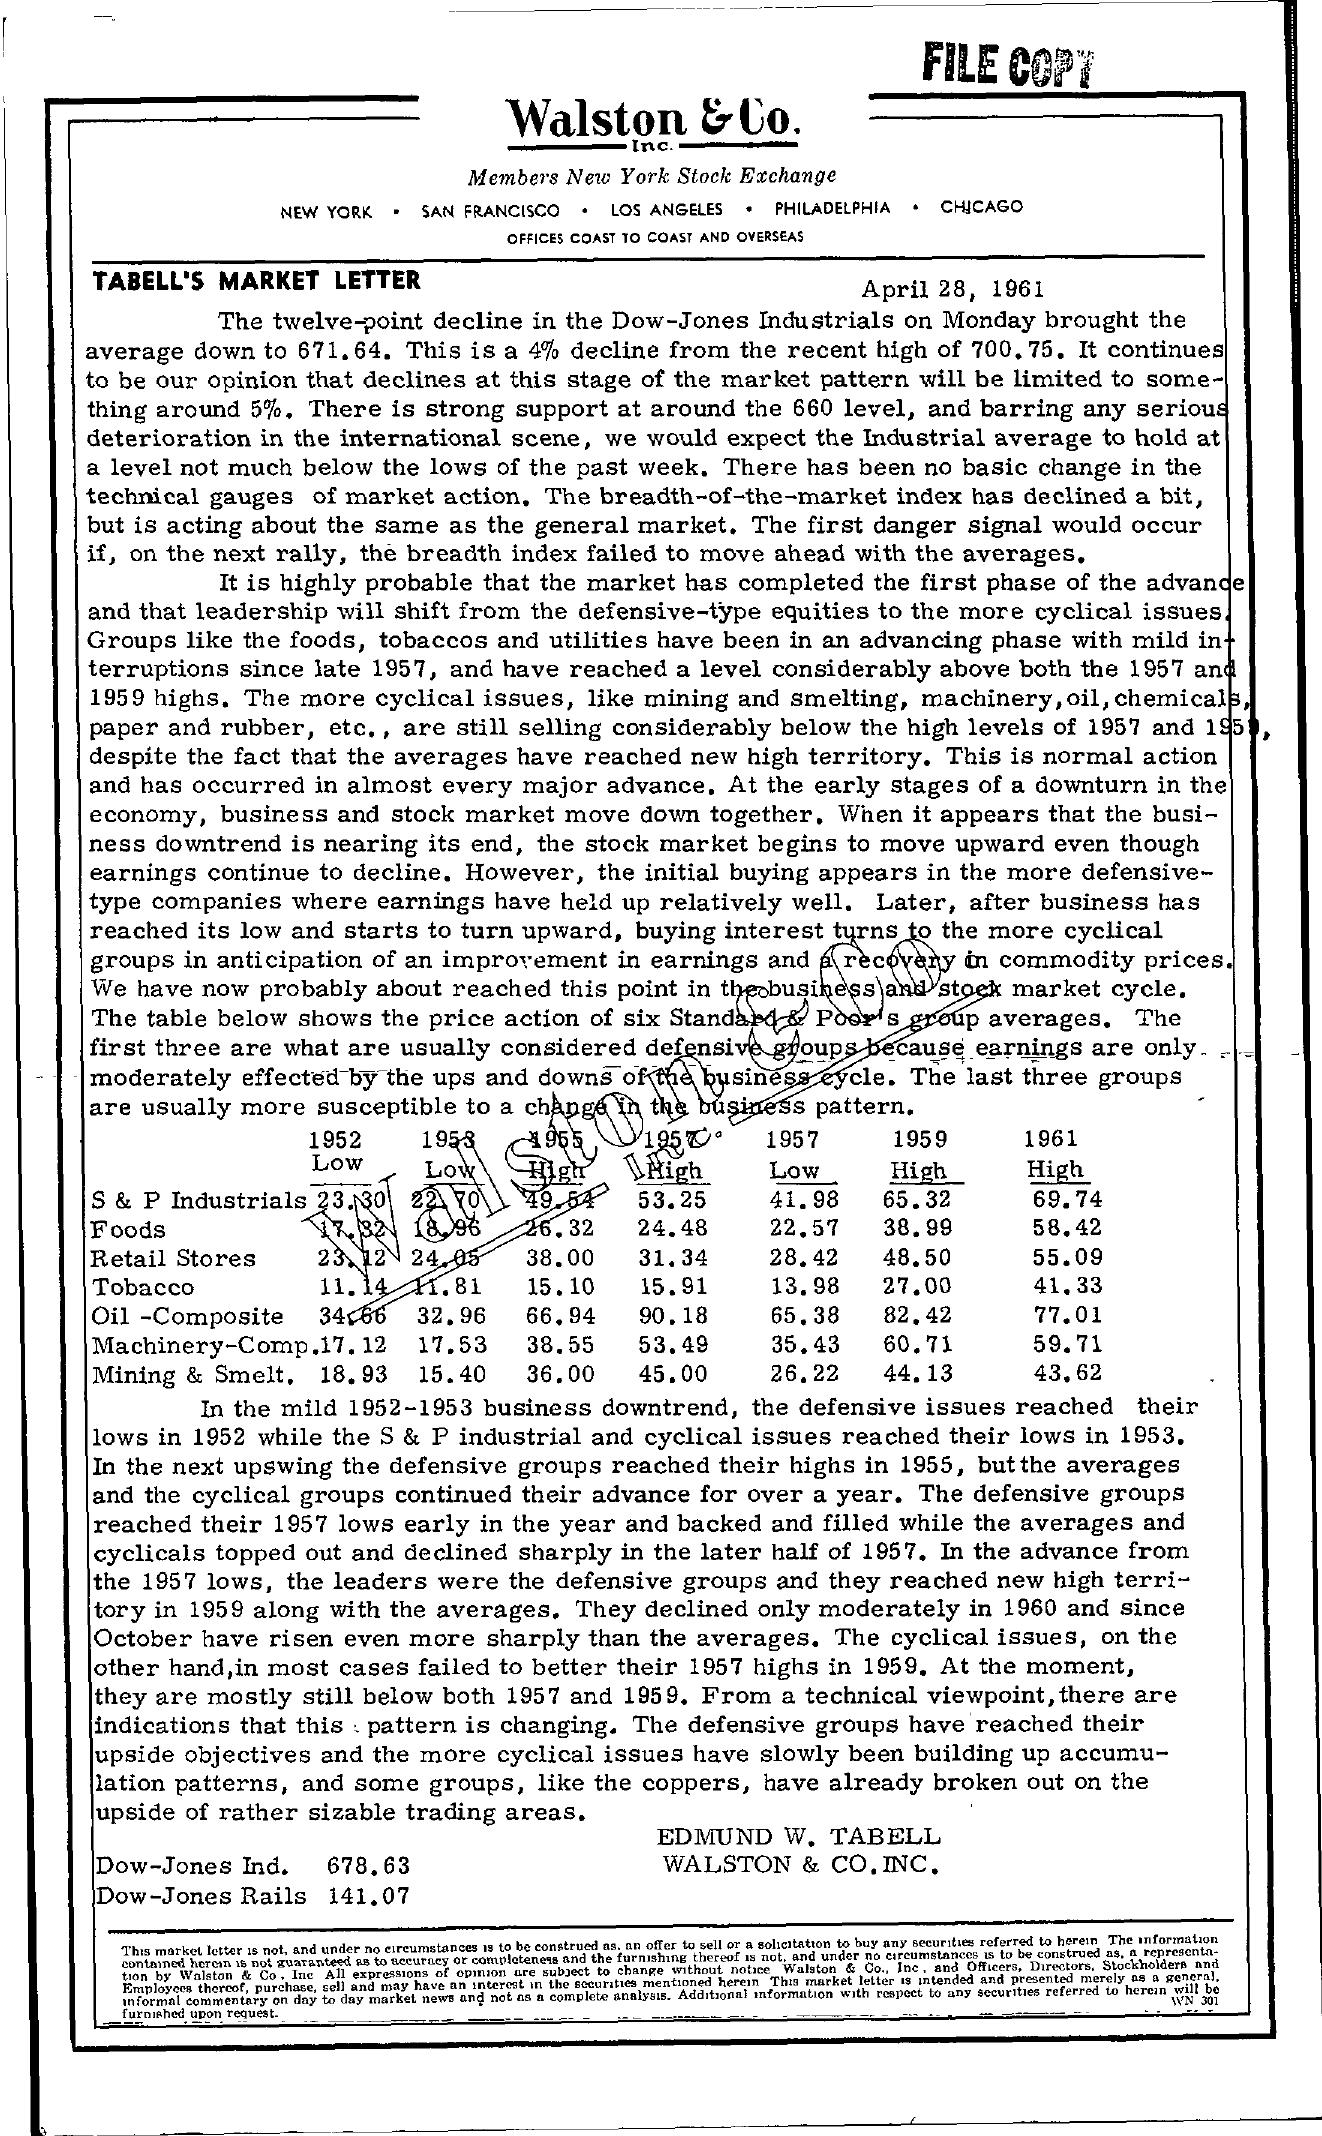 Tabell's Market Letter - April 28, 1961